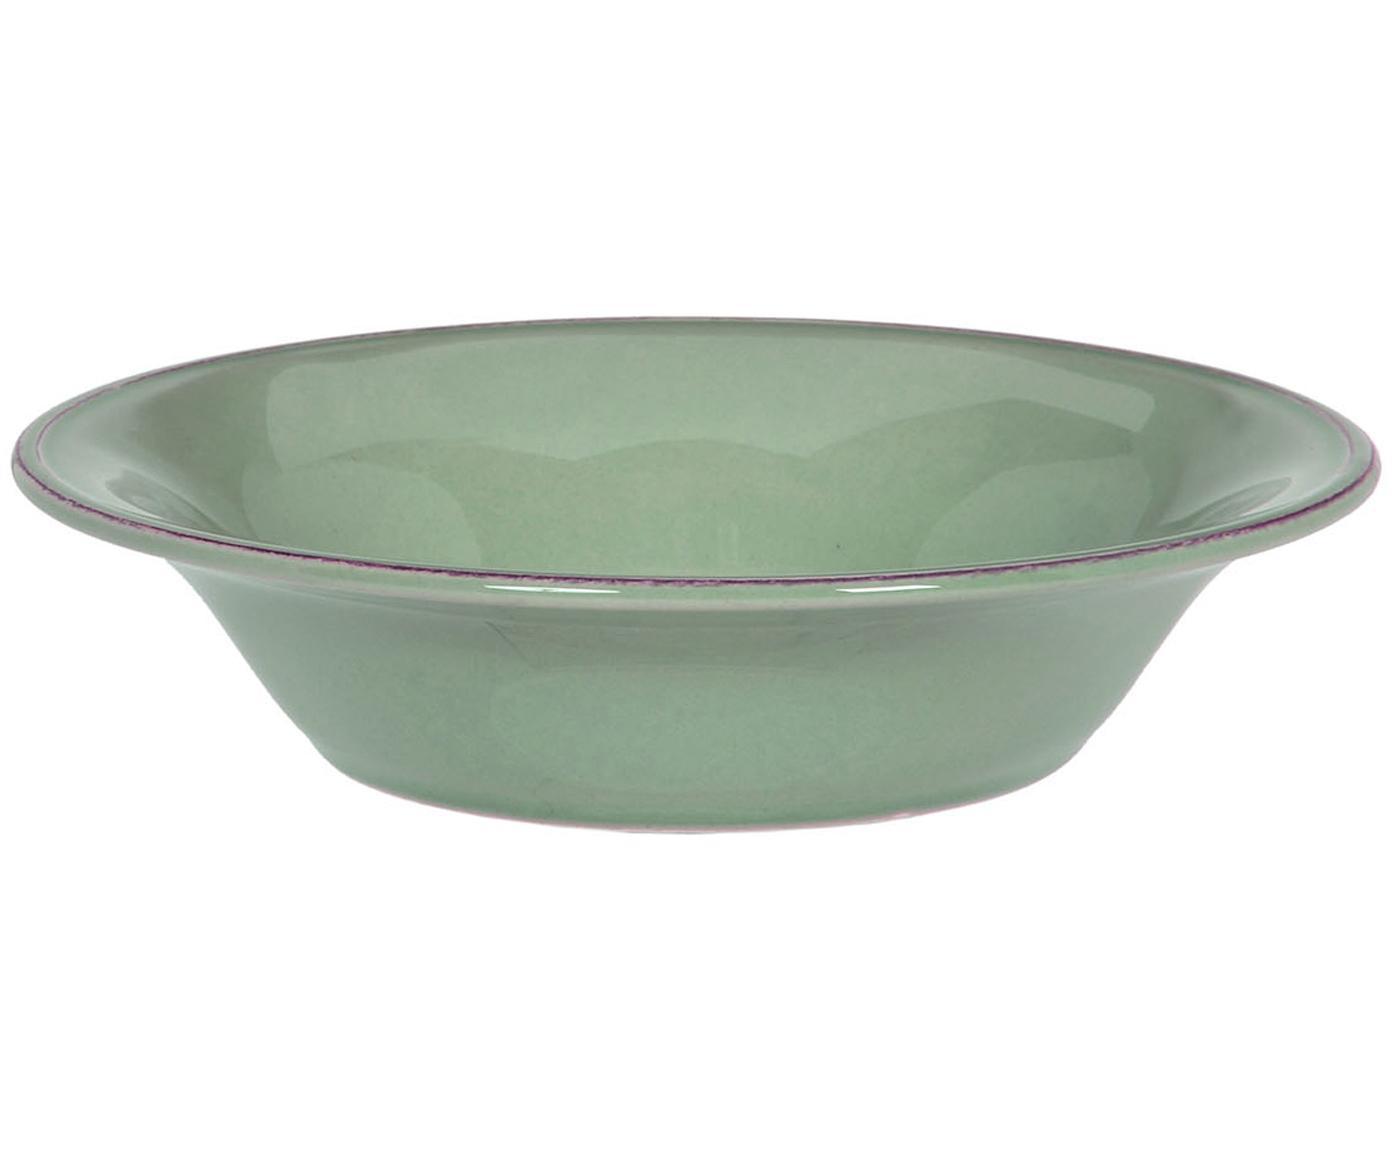 Ciotola in verde salvia Constance 2 pz, Ceramica, Verde, Ø 19 x Alt. 5 cm